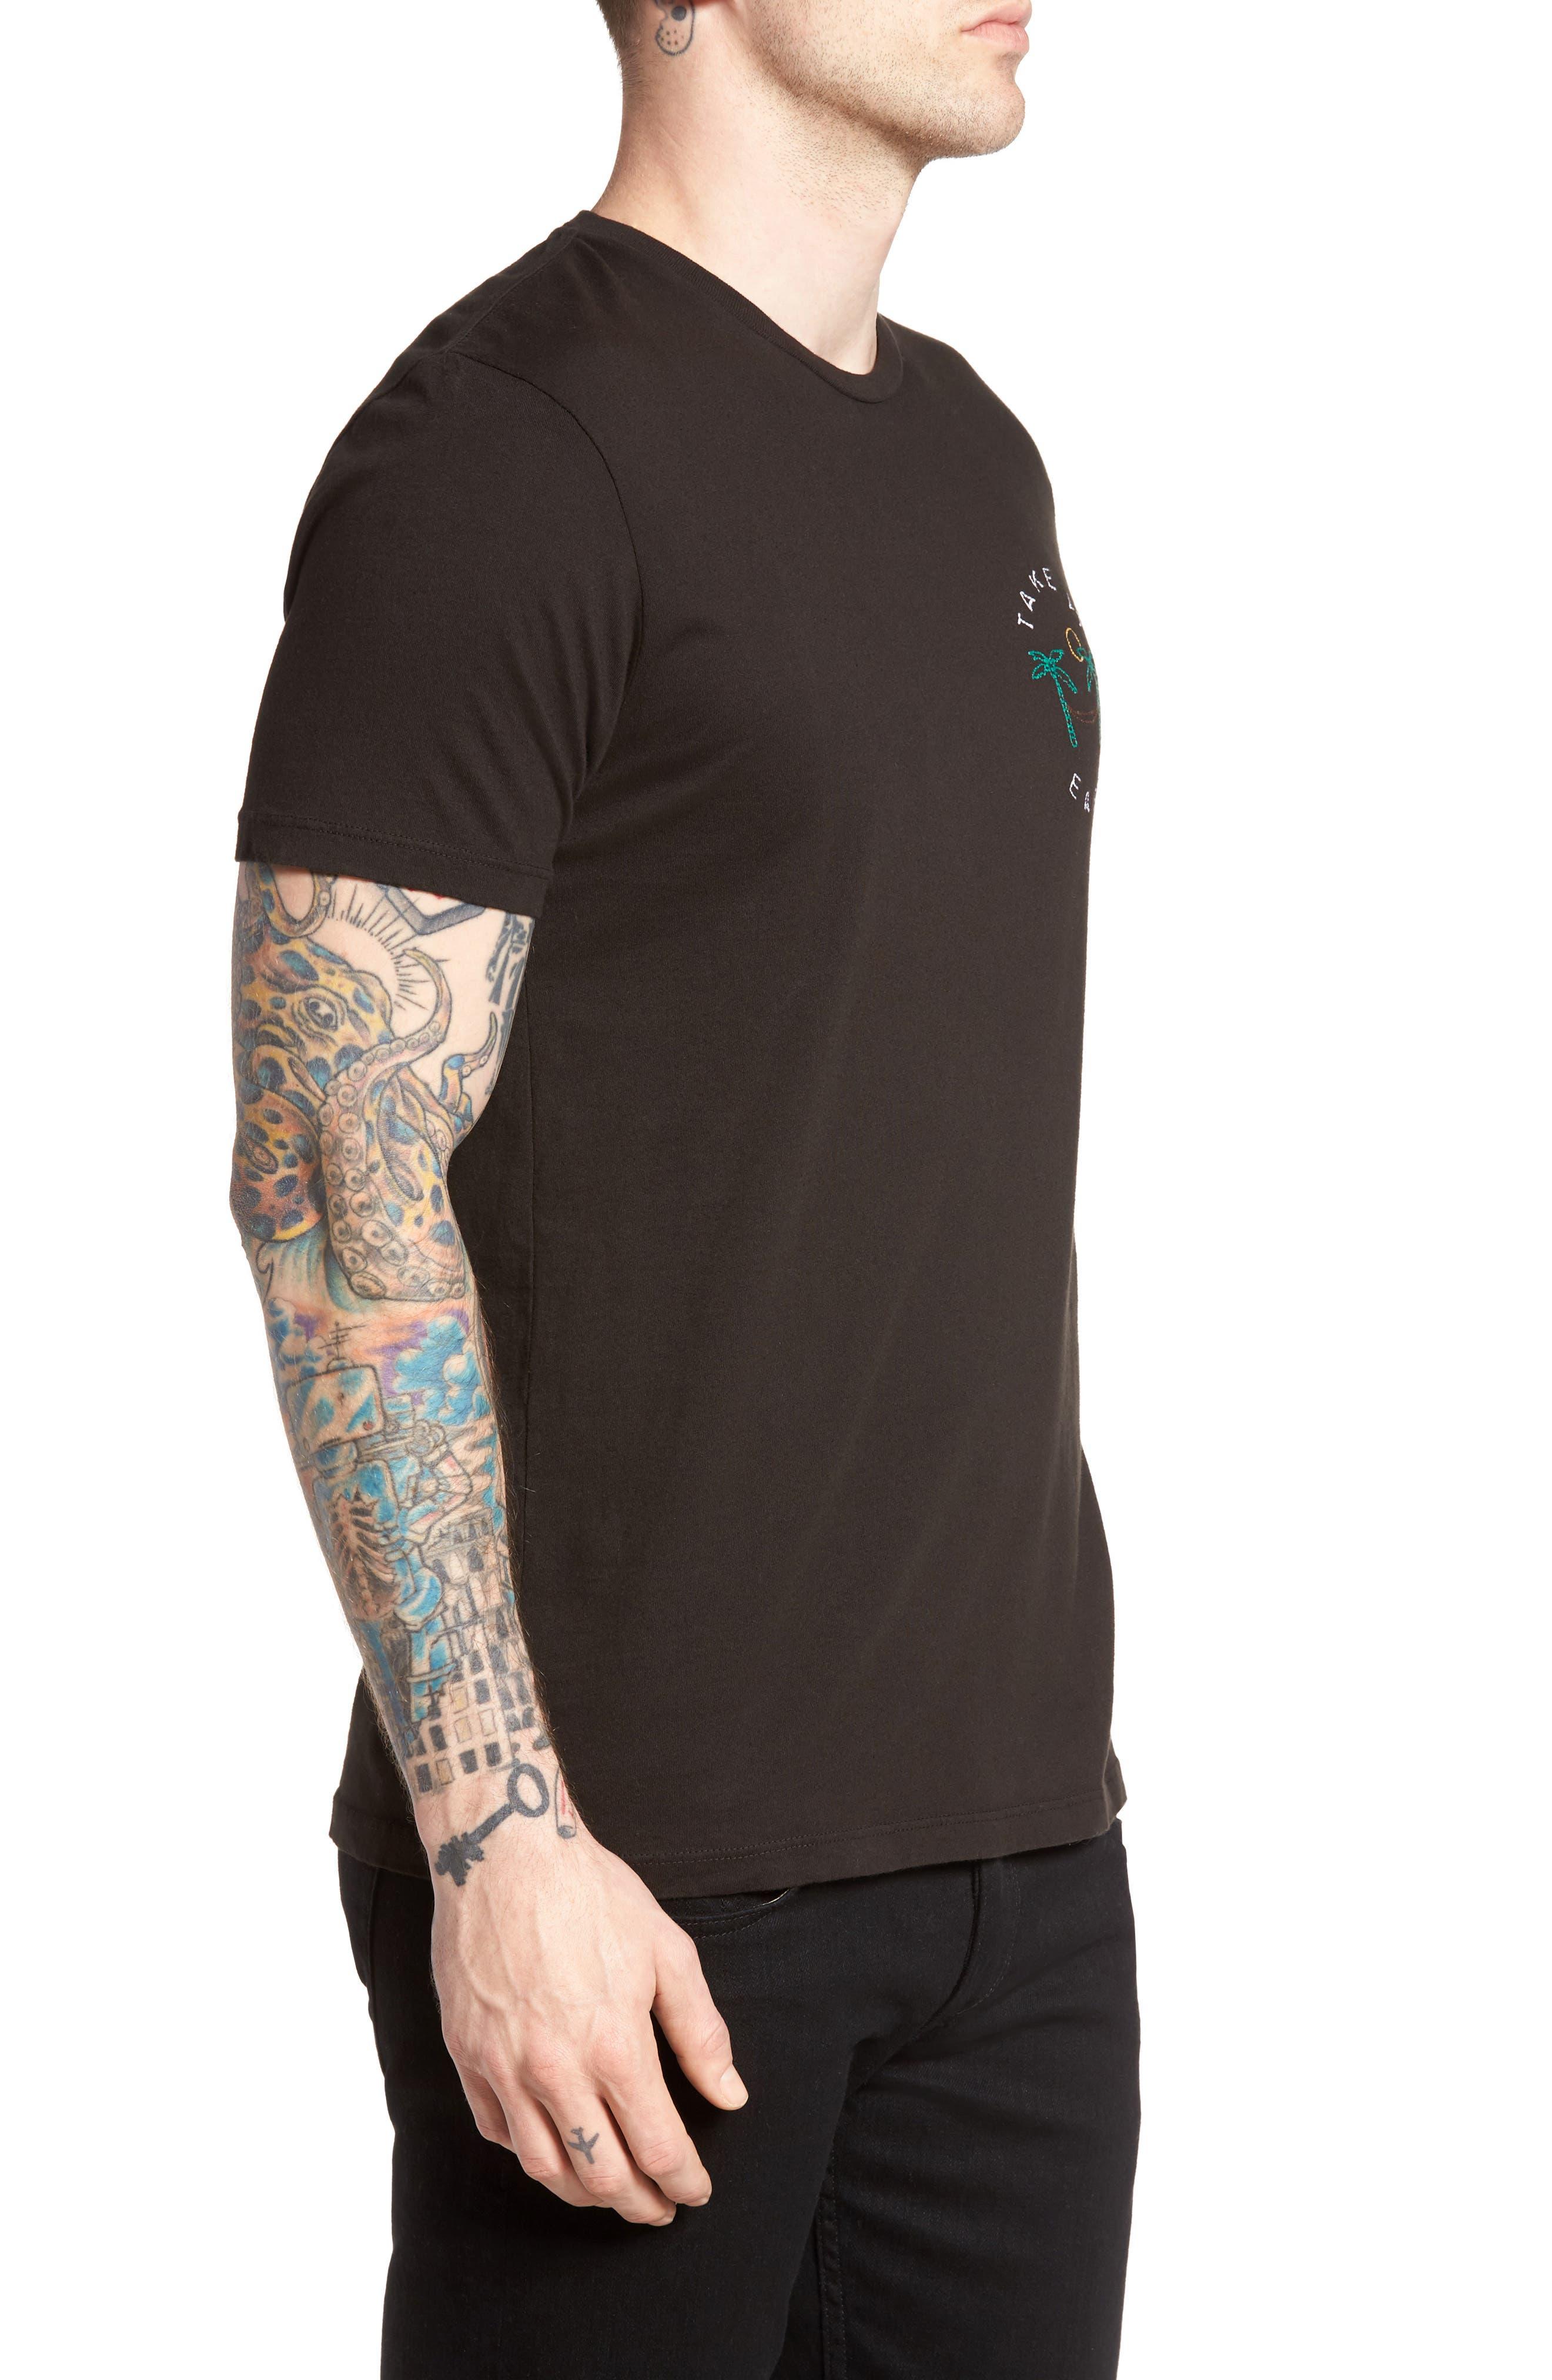 Take It Easy T-Shirt,                             Alternate thumbnail 3, color,